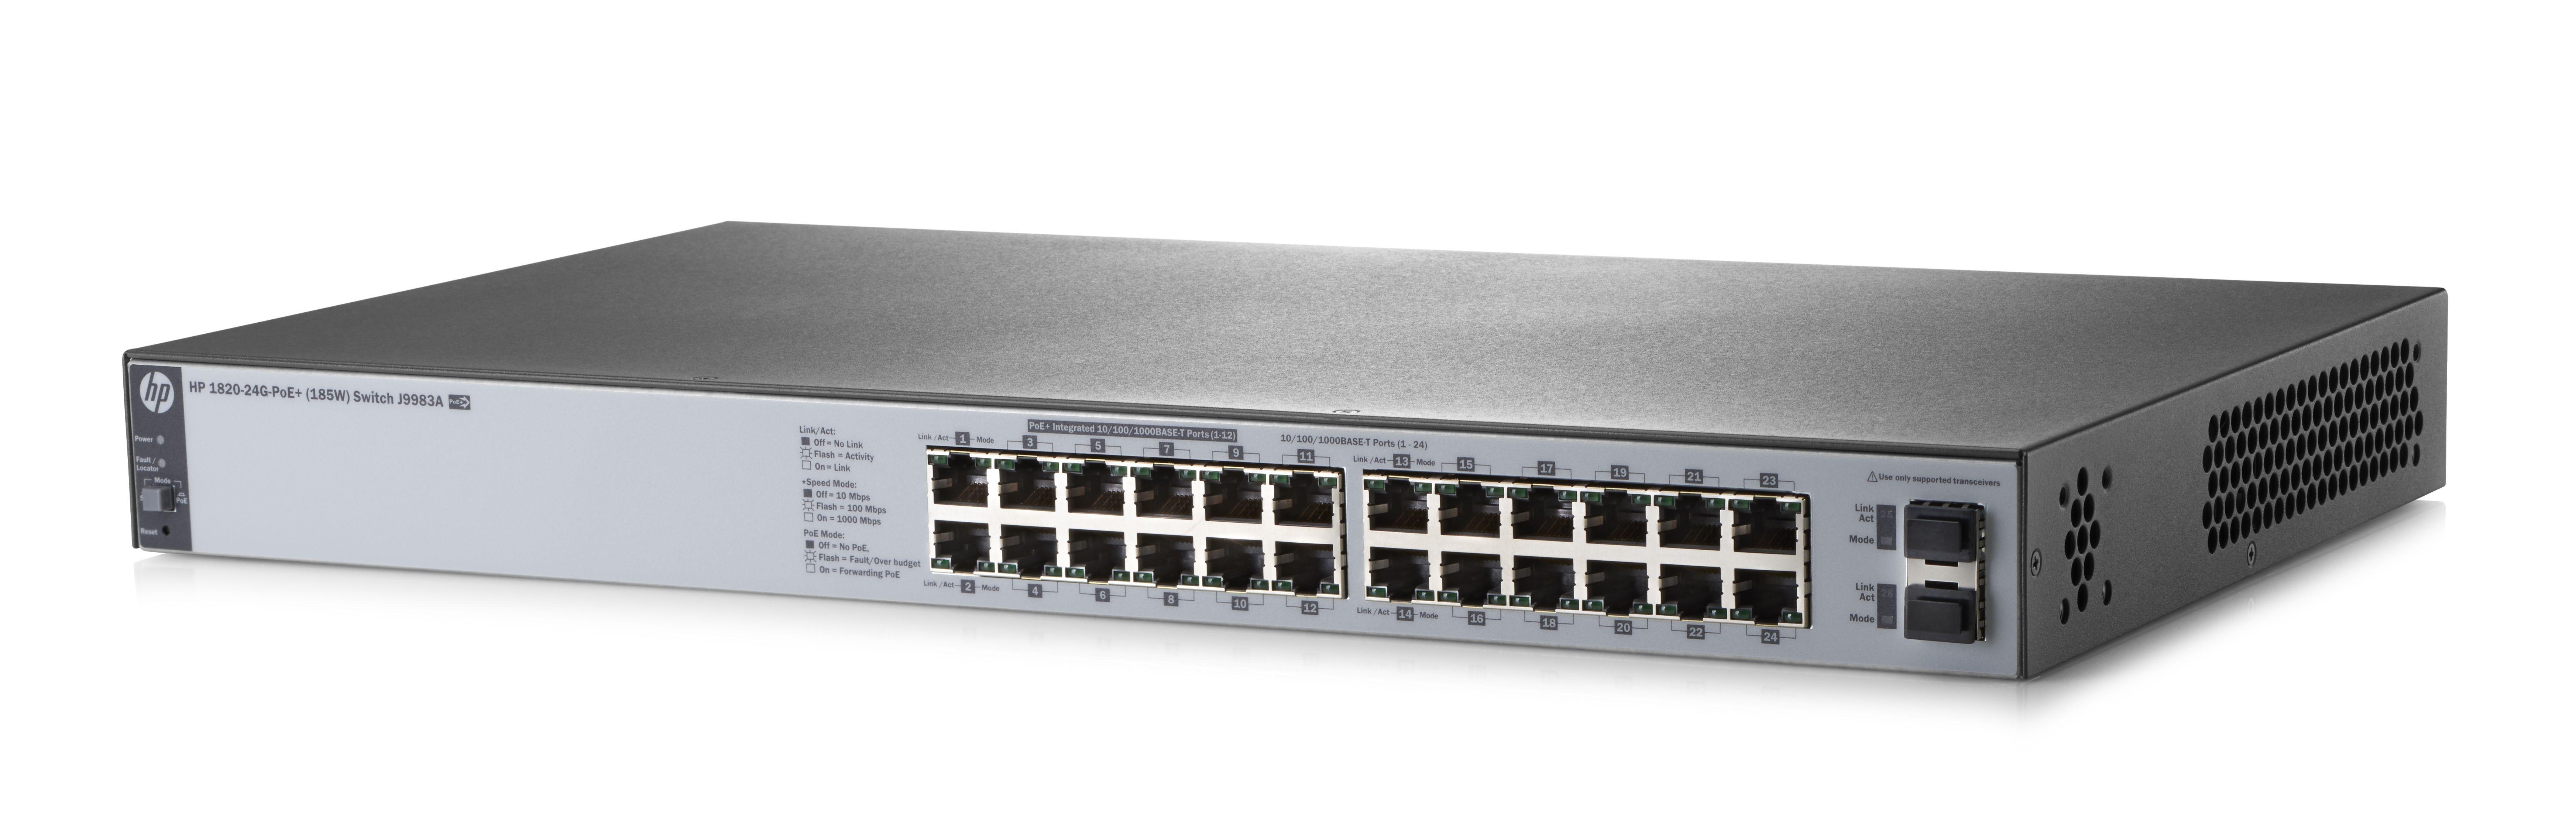 HP J9983A HPE 1820-24G-POE+ (185W) SWITCH